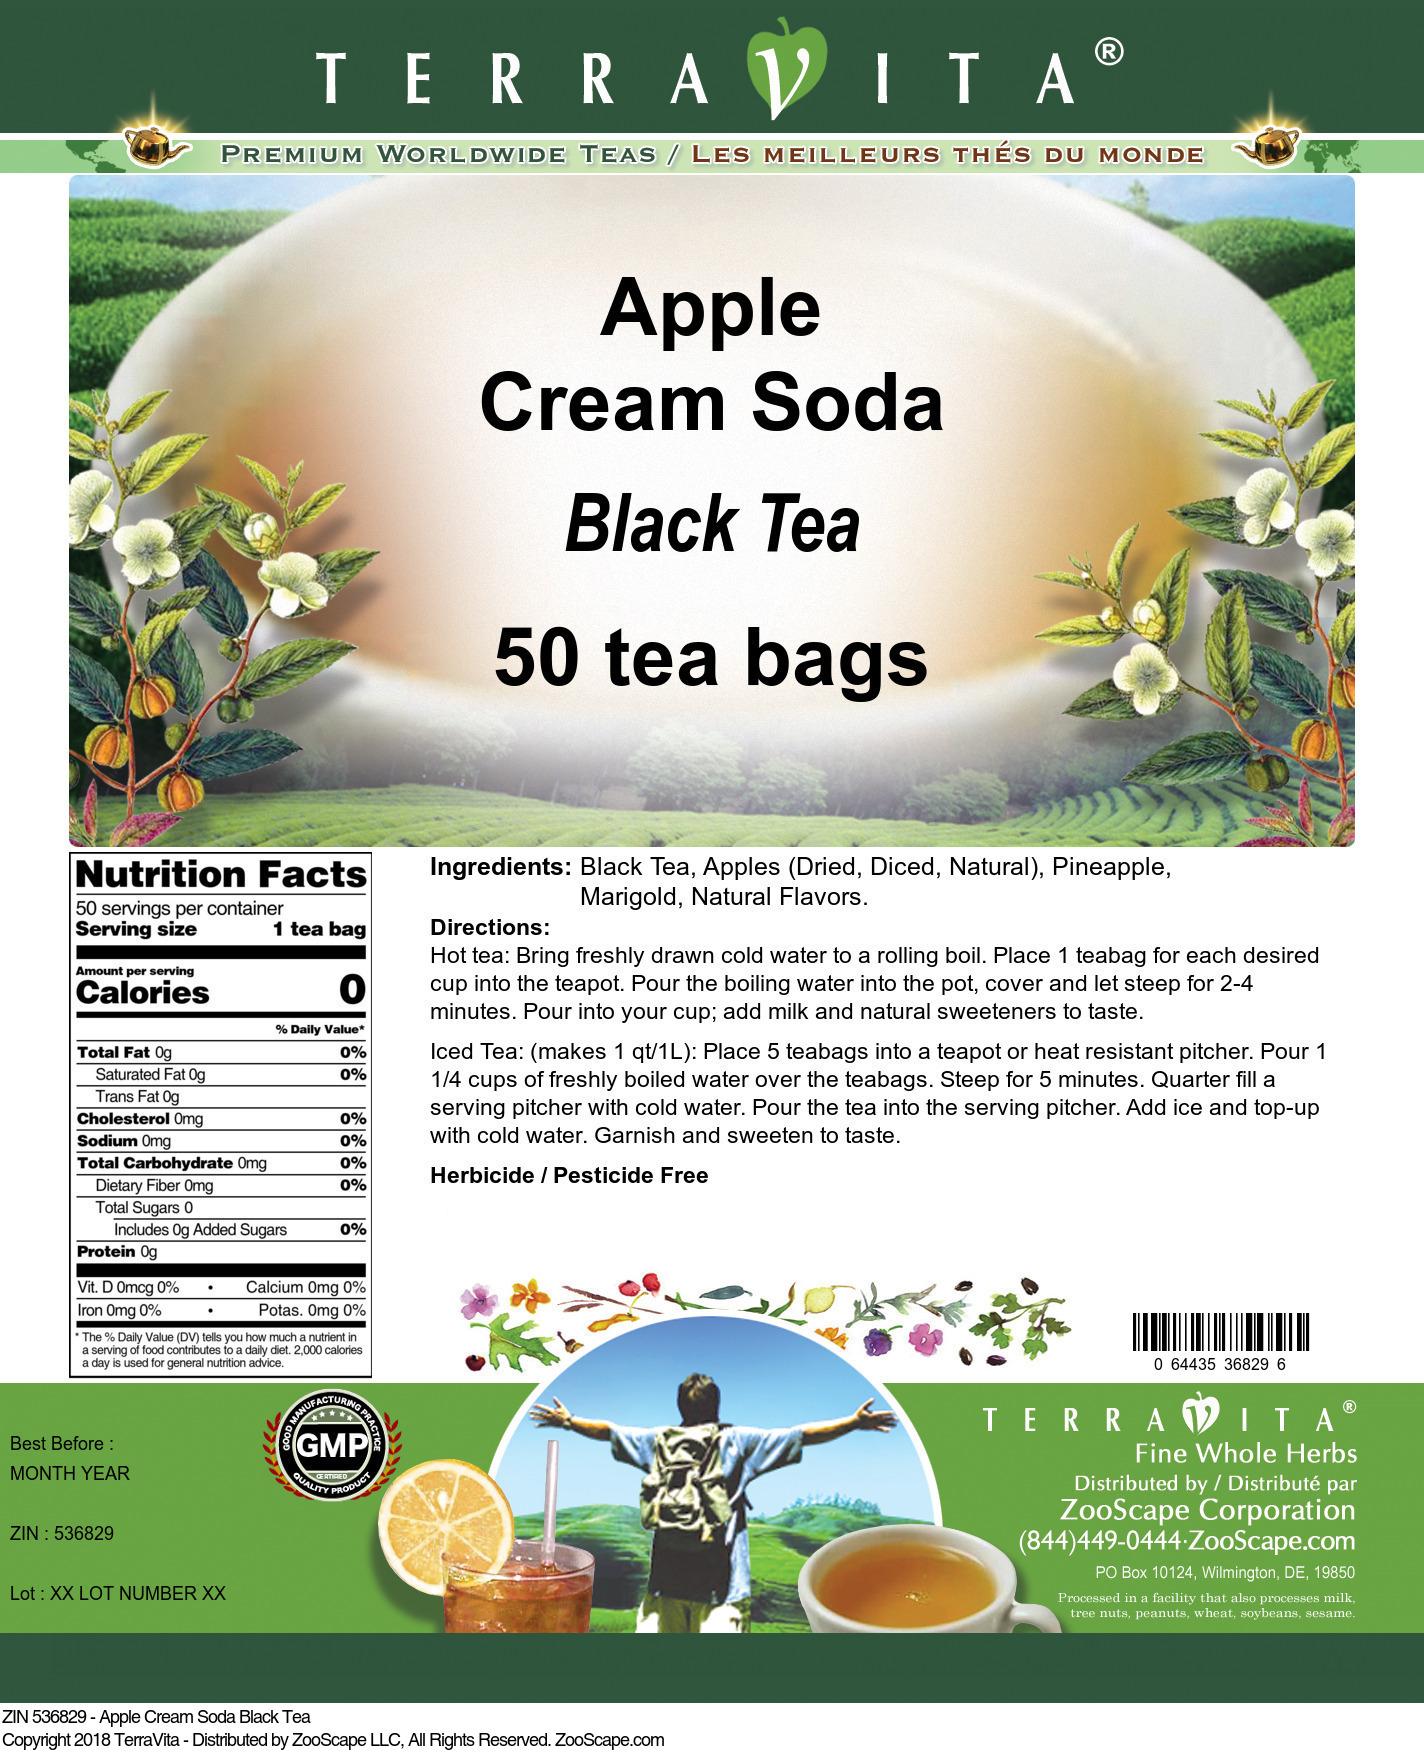 Apple Cream Soda Black Tea